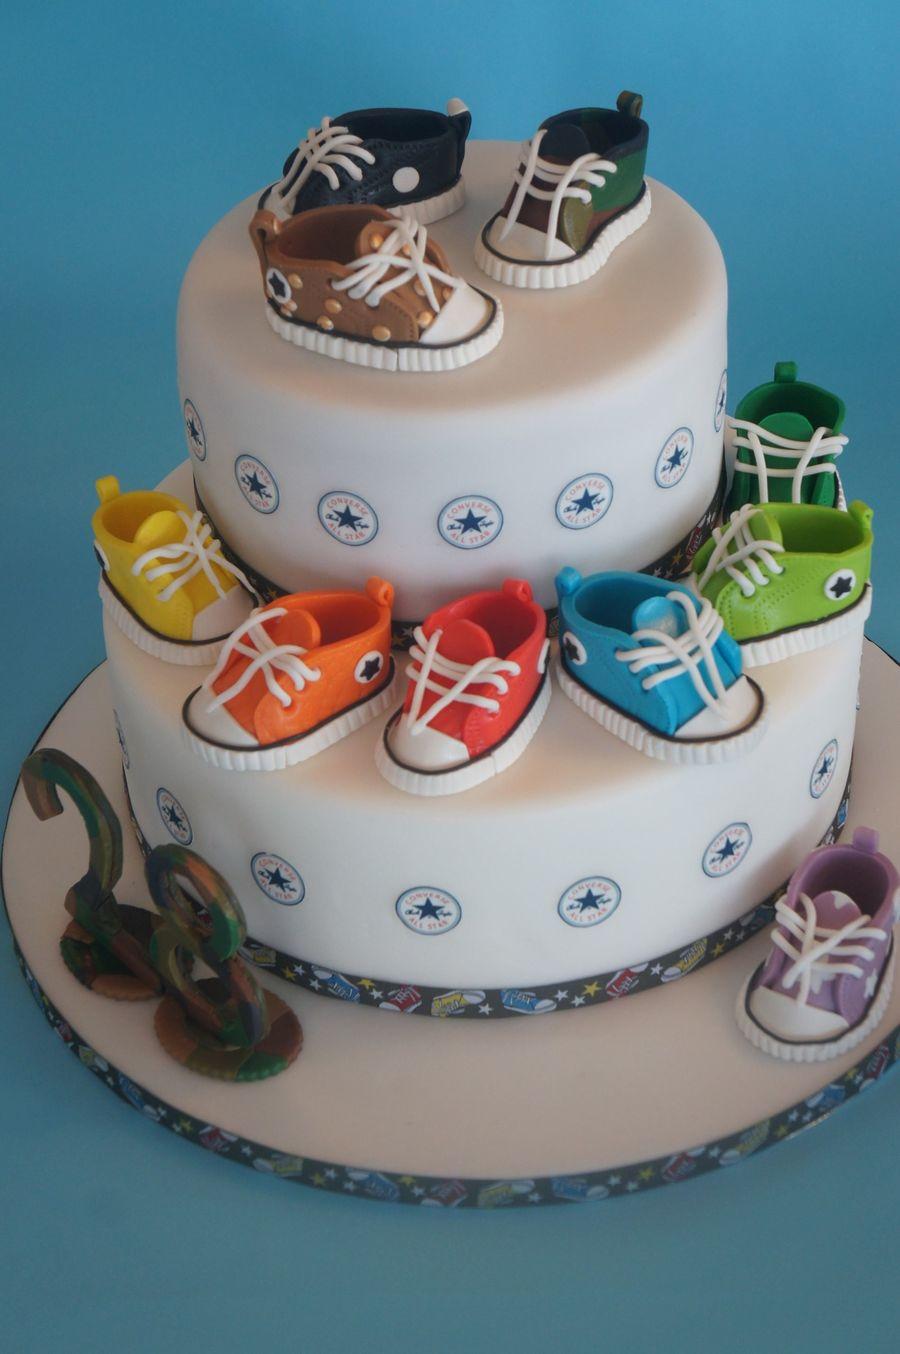 New All Star Fashion Cake CakeCentralcom - All star birthday cake